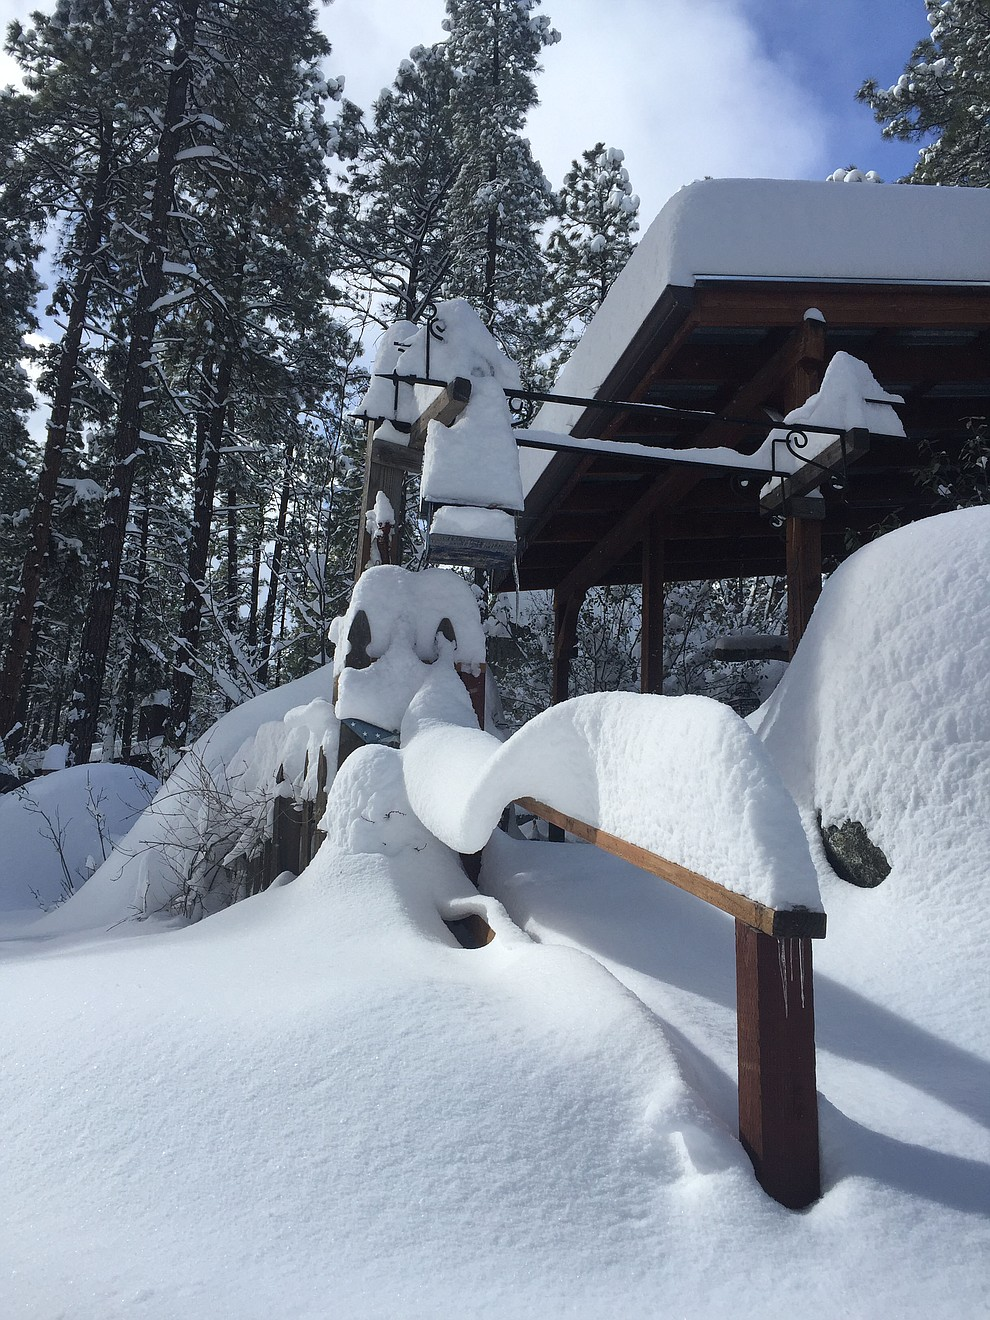 Snow wave on my neighbors banister